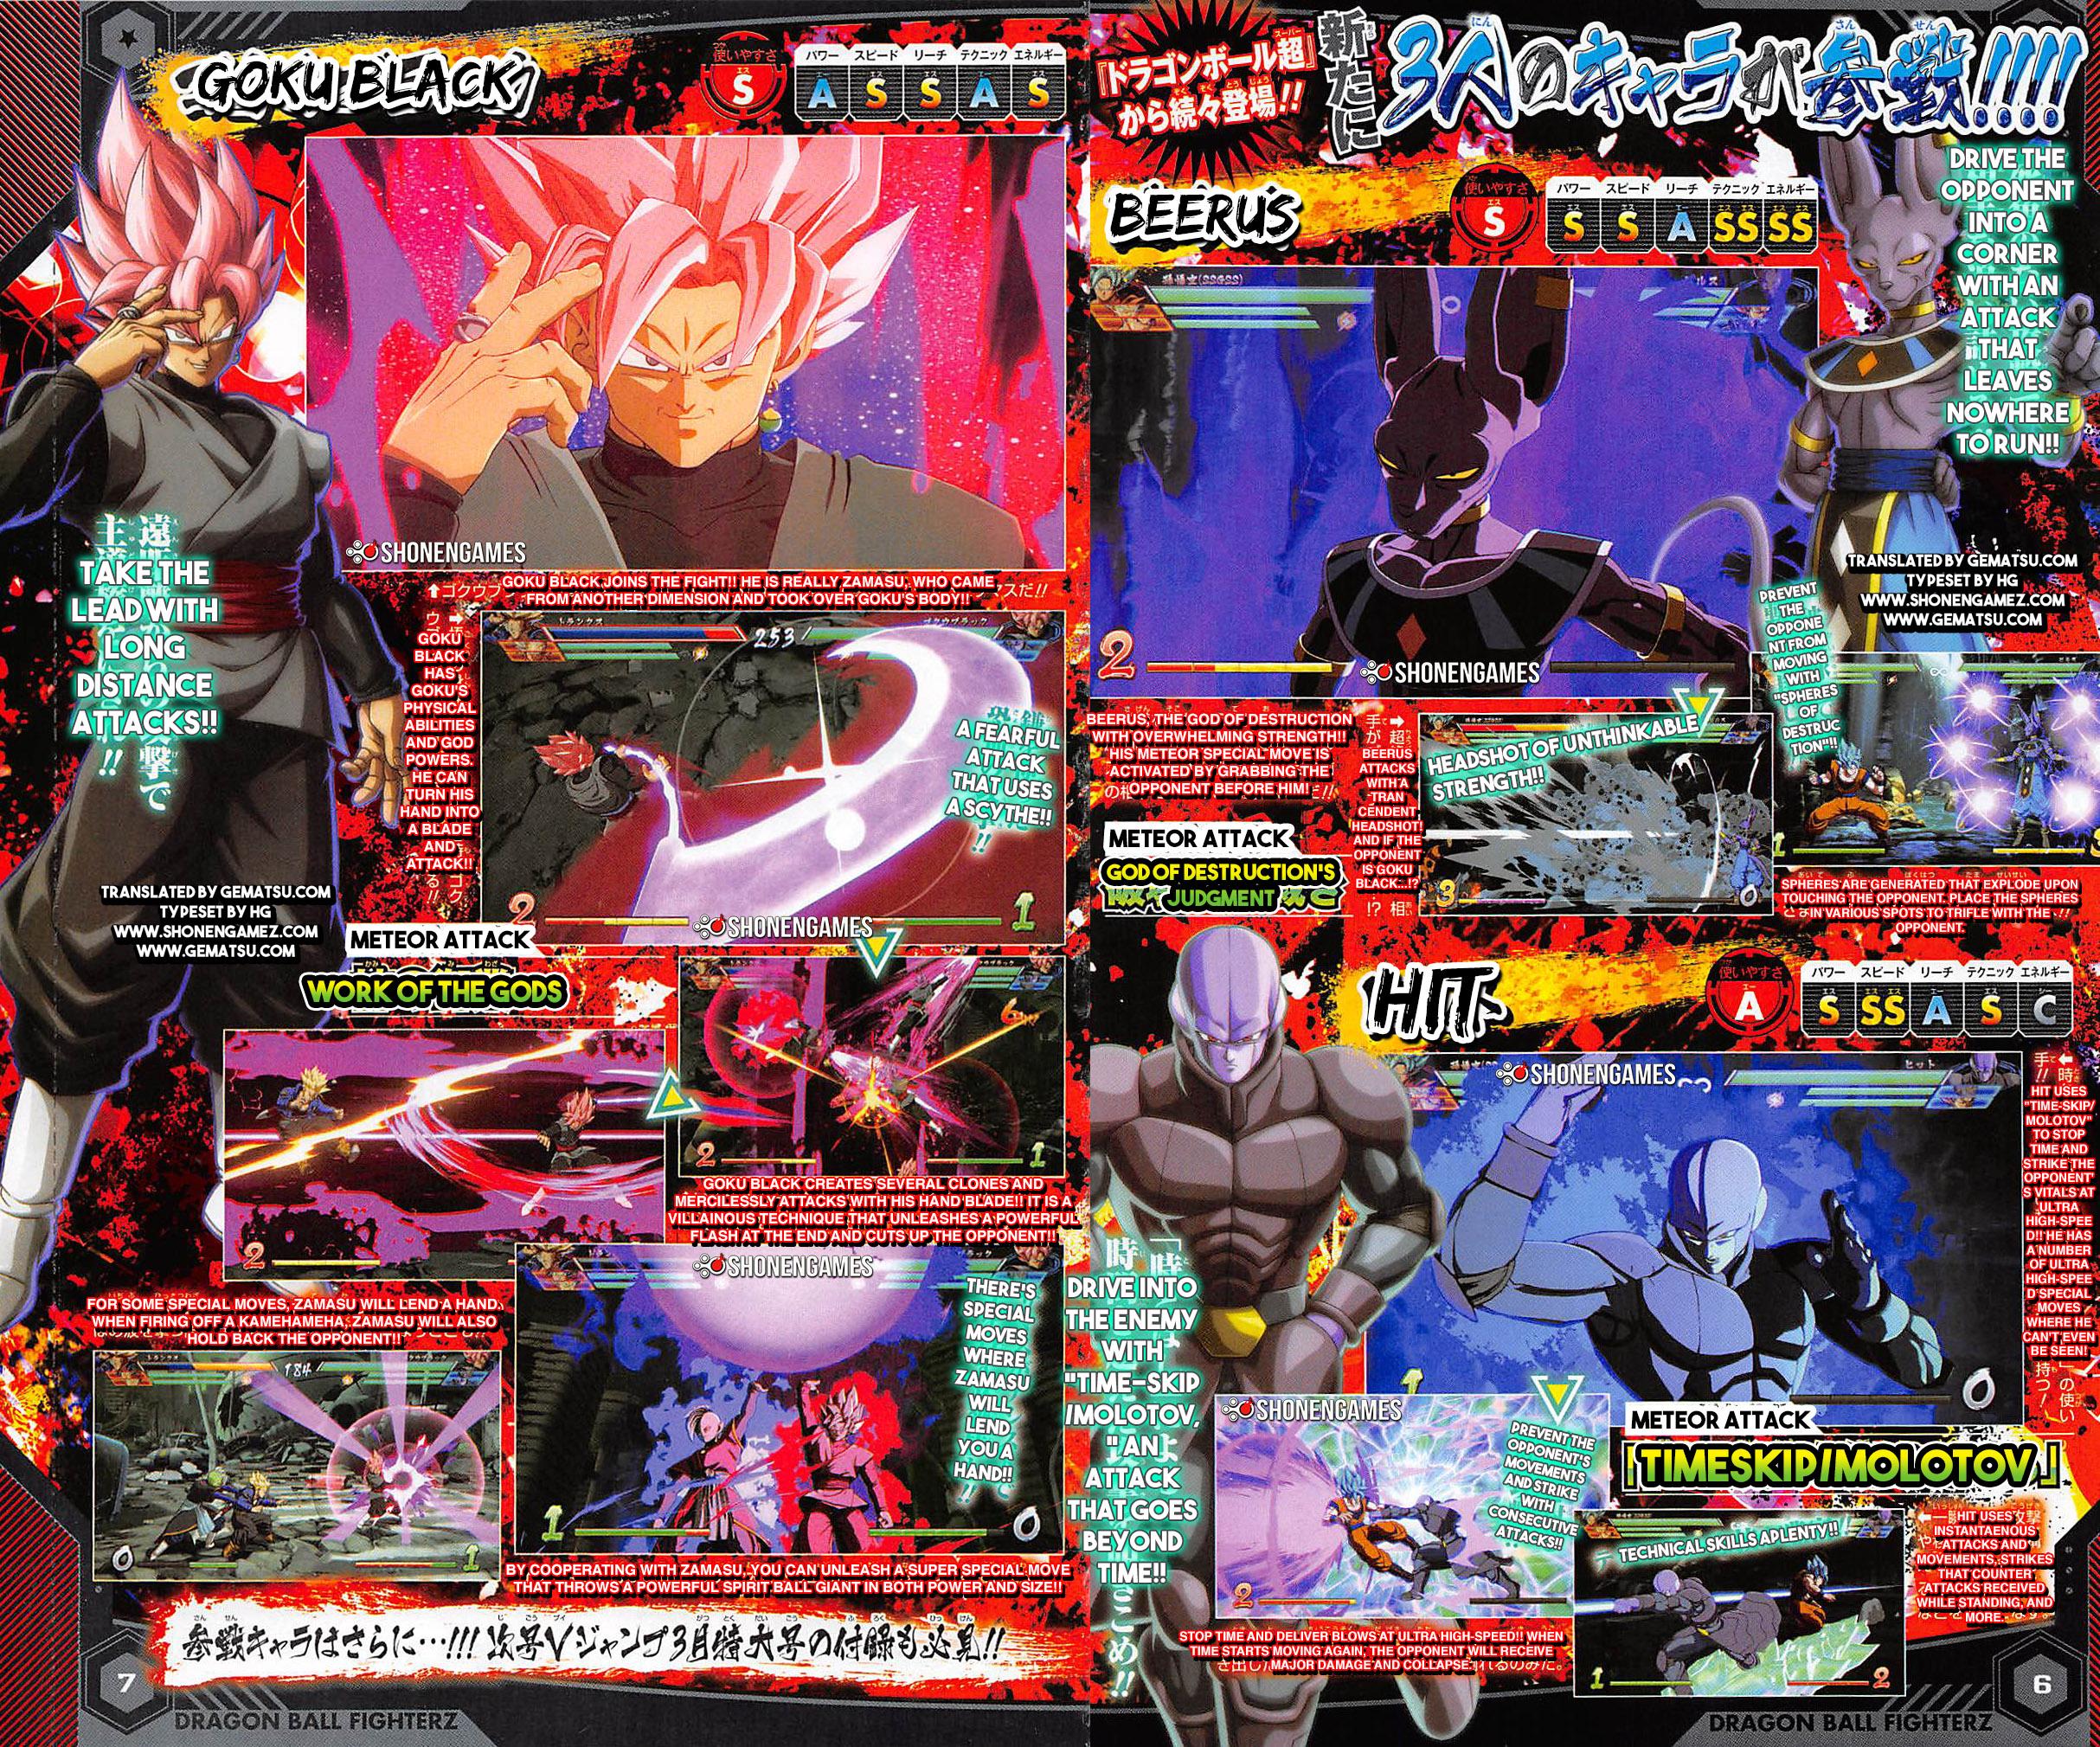 Dragon Ball FighterZ: Beerus, Hit et Gokû Black (& Zamasu) confirmés avec leurs attaques Spécial Meteor